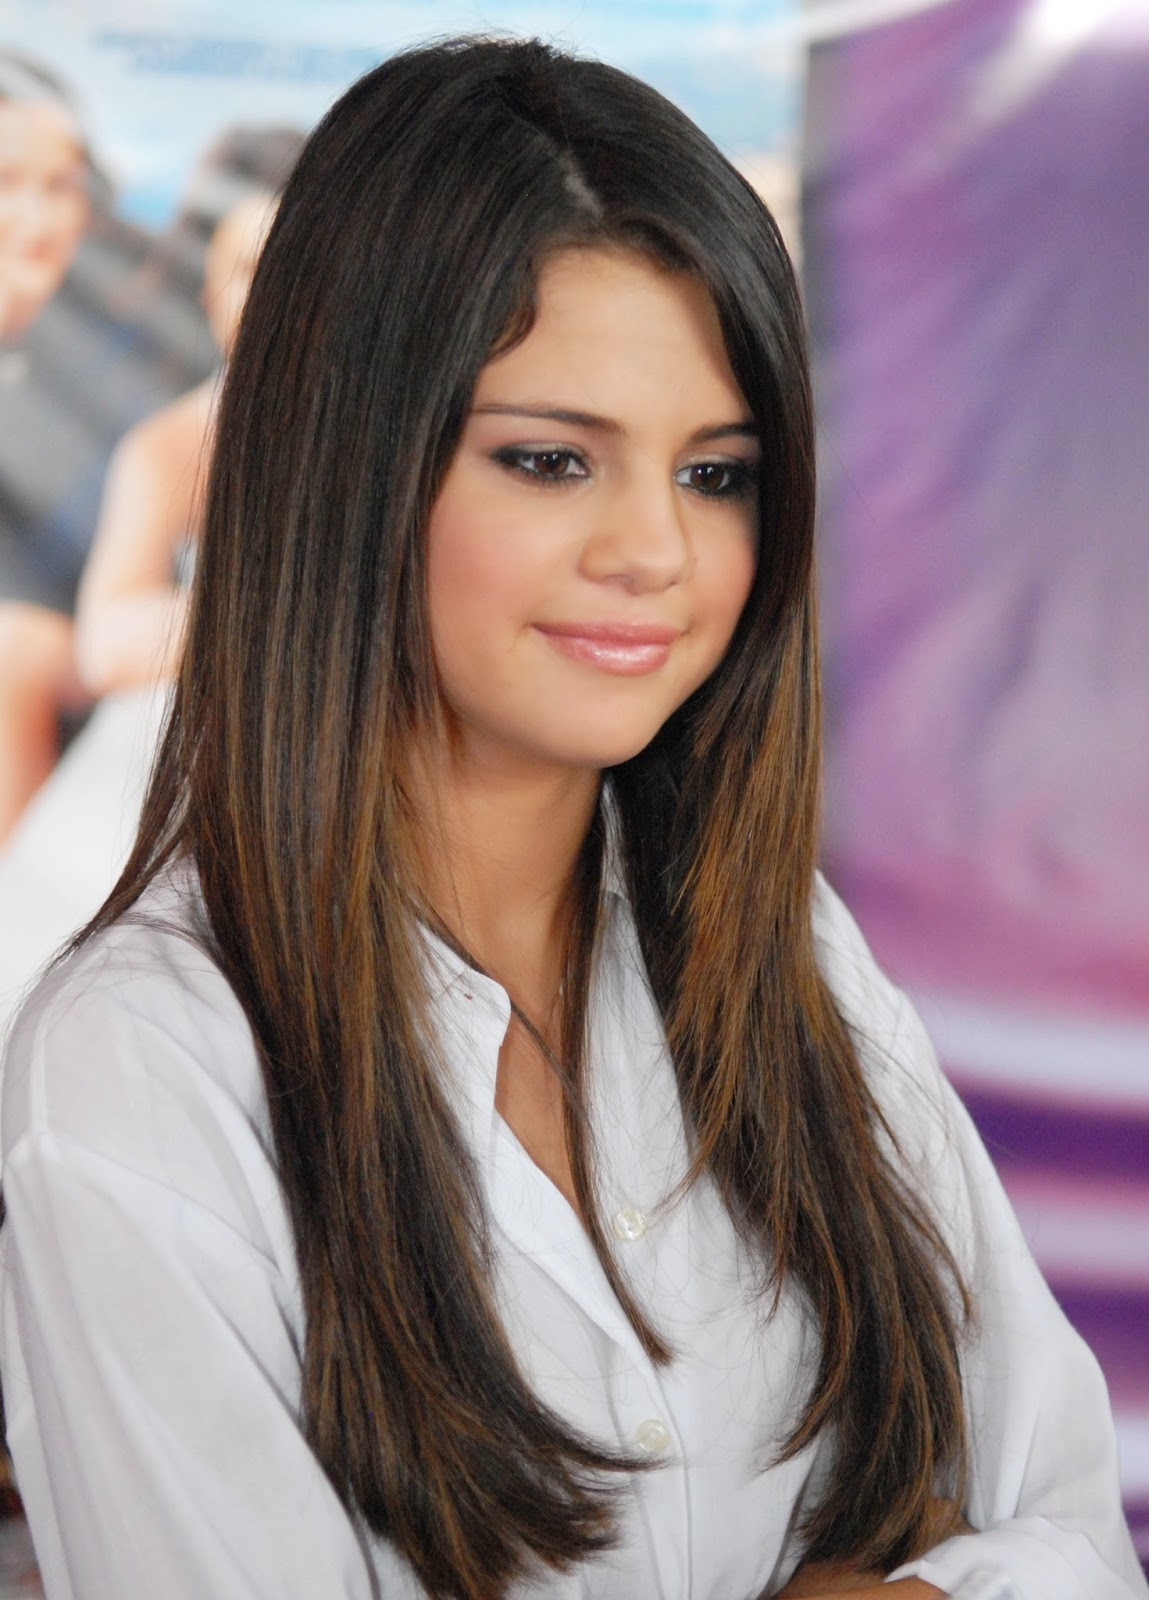 Celebrity Hairstyles Celebrity Selena Gomez Hairstyles